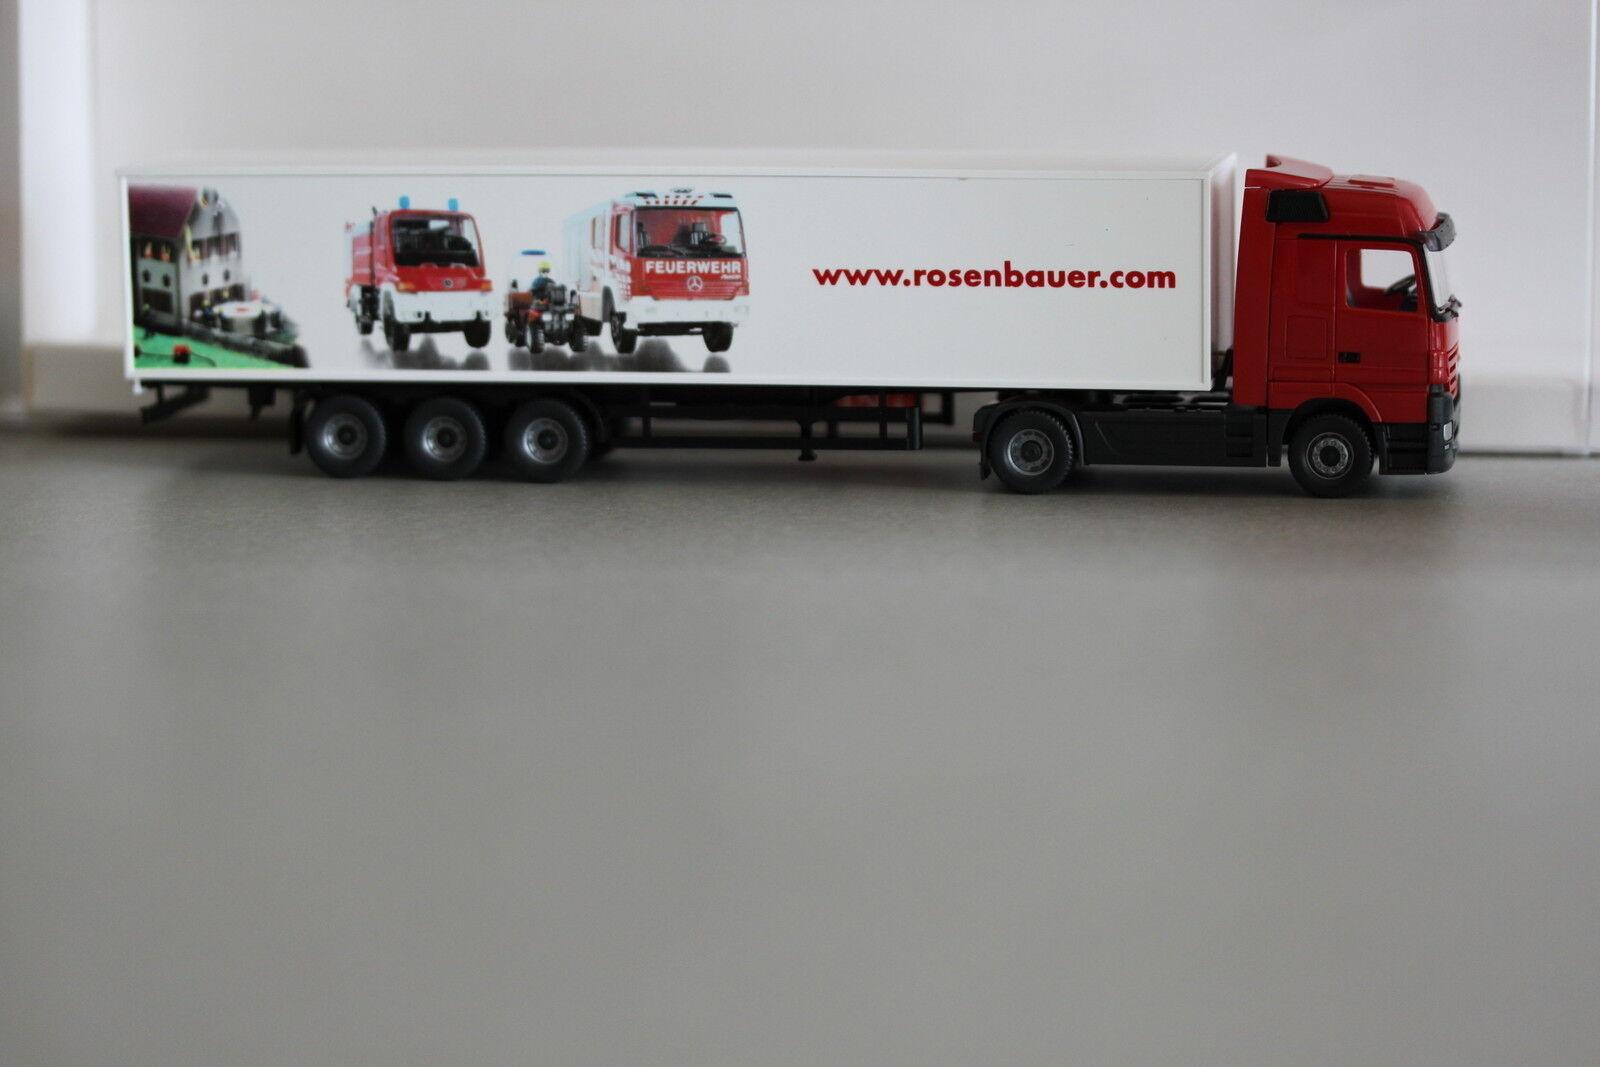 Wiking 538 12 Koffer-Sattelzug MB Actros pinknbauer Feuerwehr - Systeme 1 87 Spu